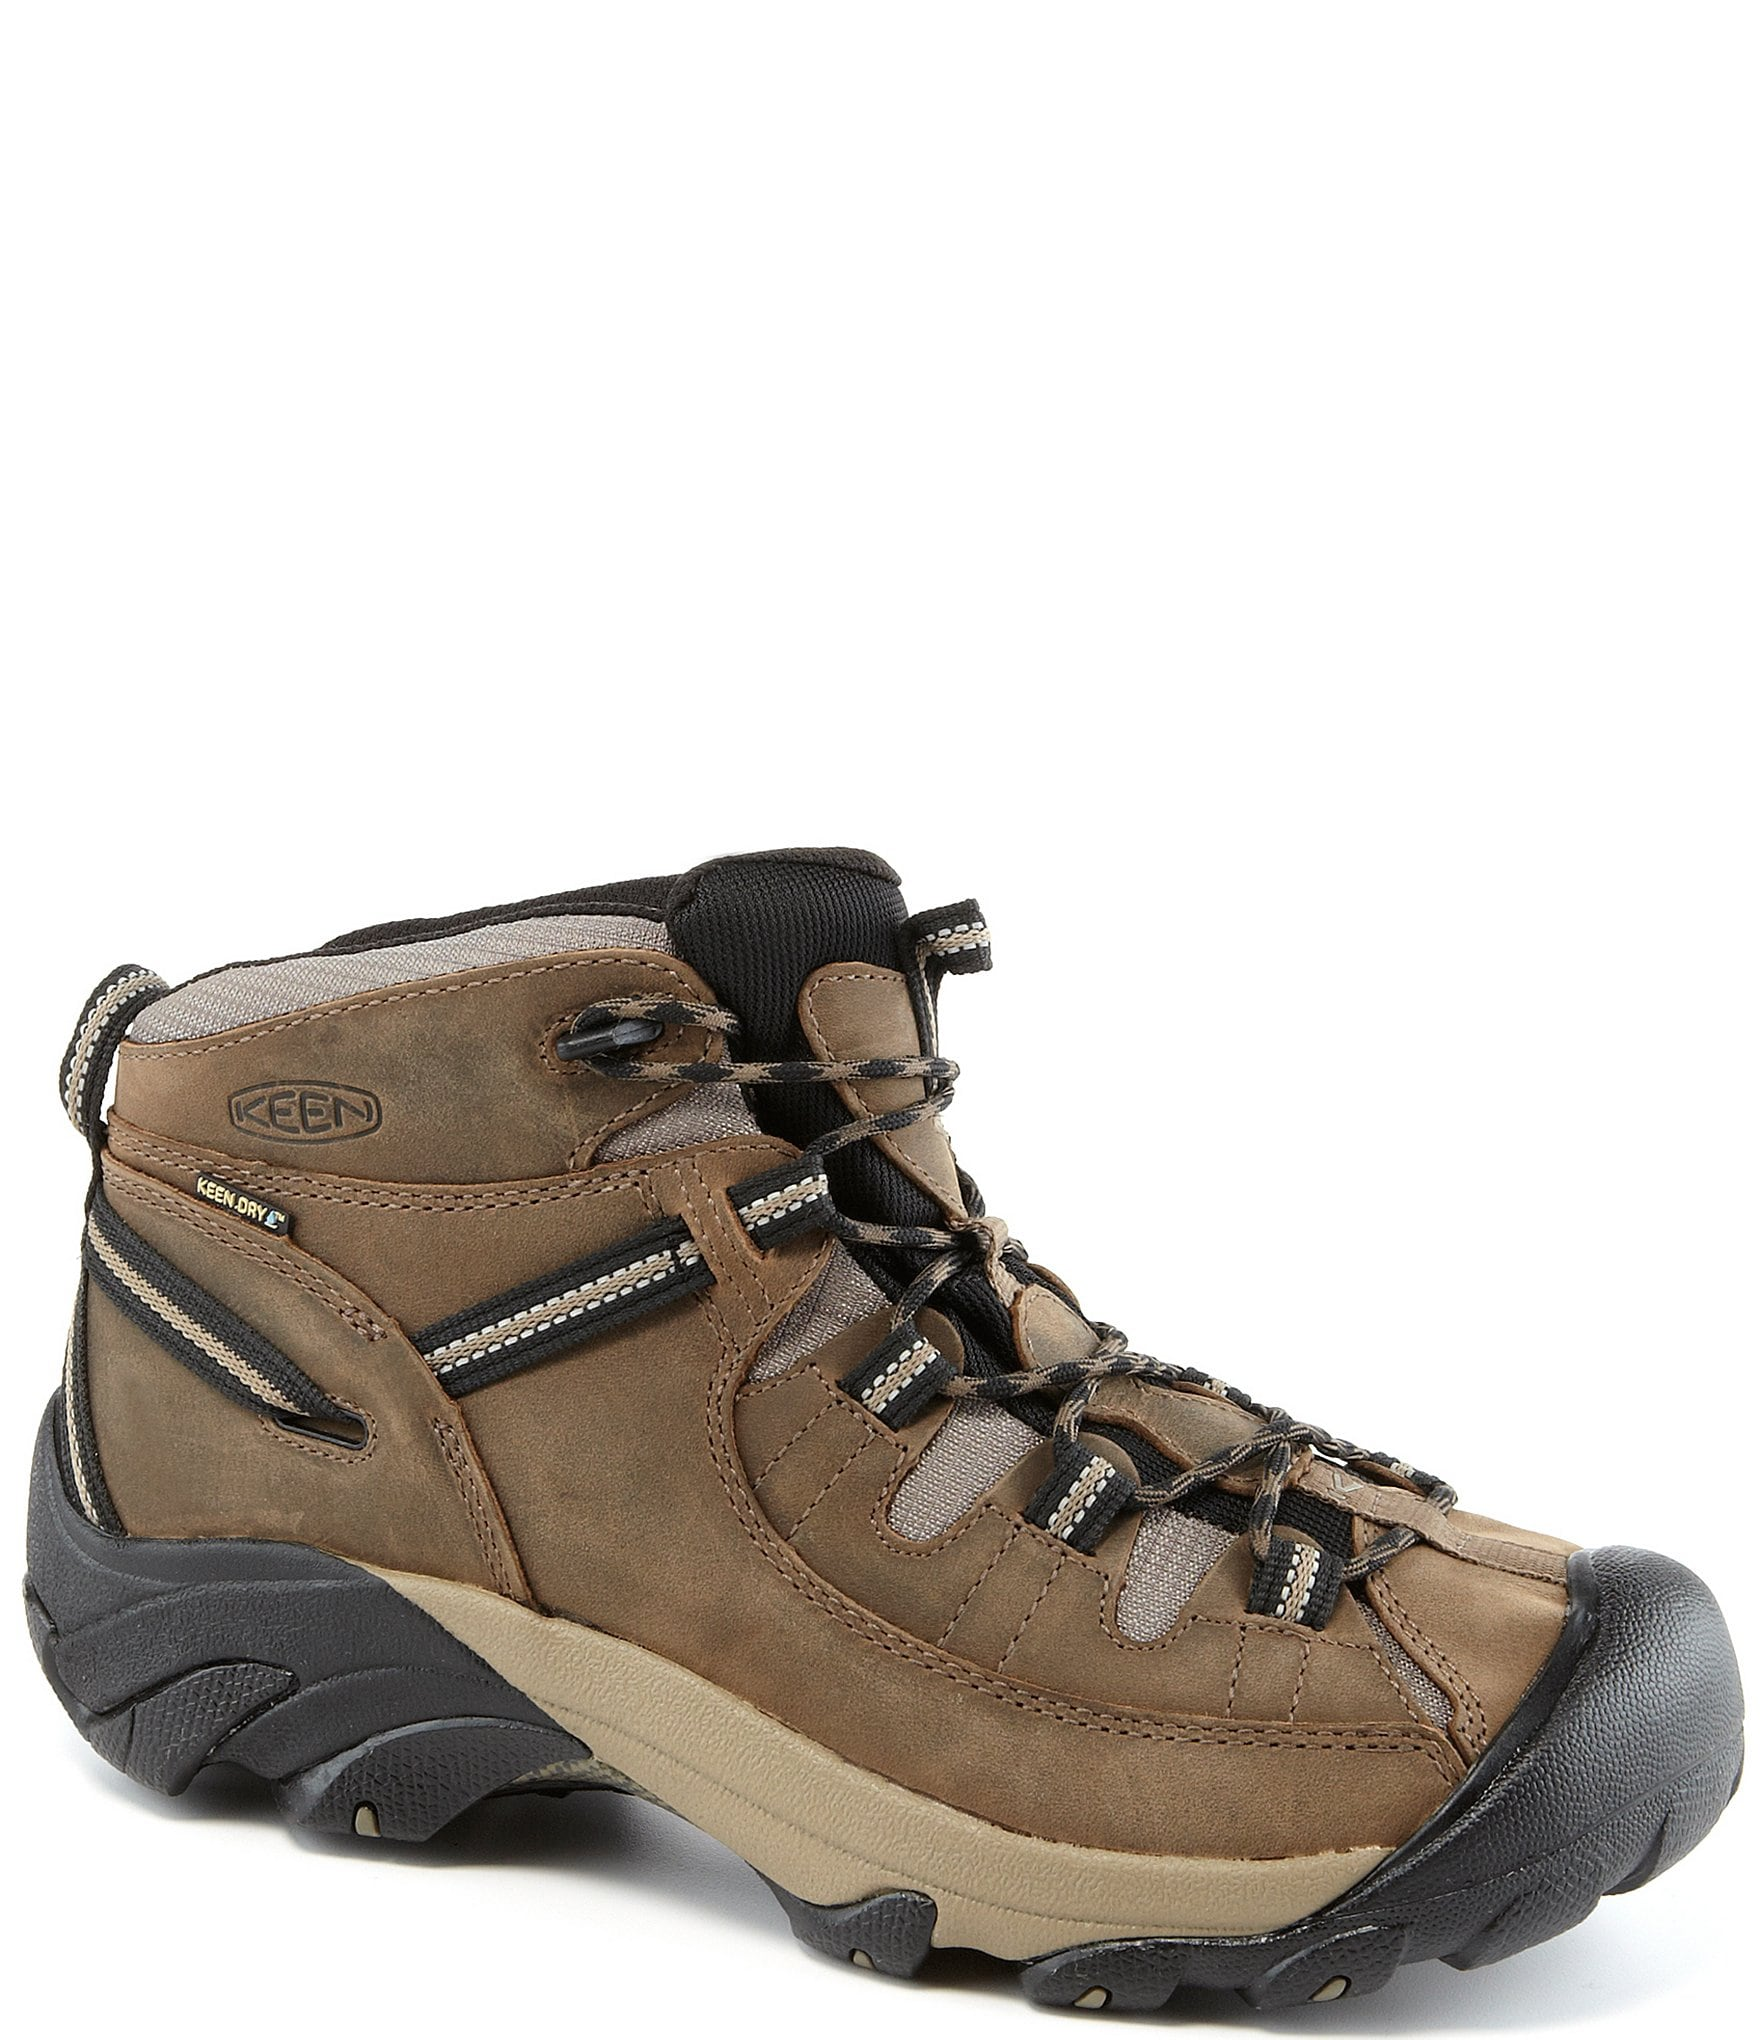 Running Mens Outdoor Shoes Dillards Austin Wedges Montana Beige 36